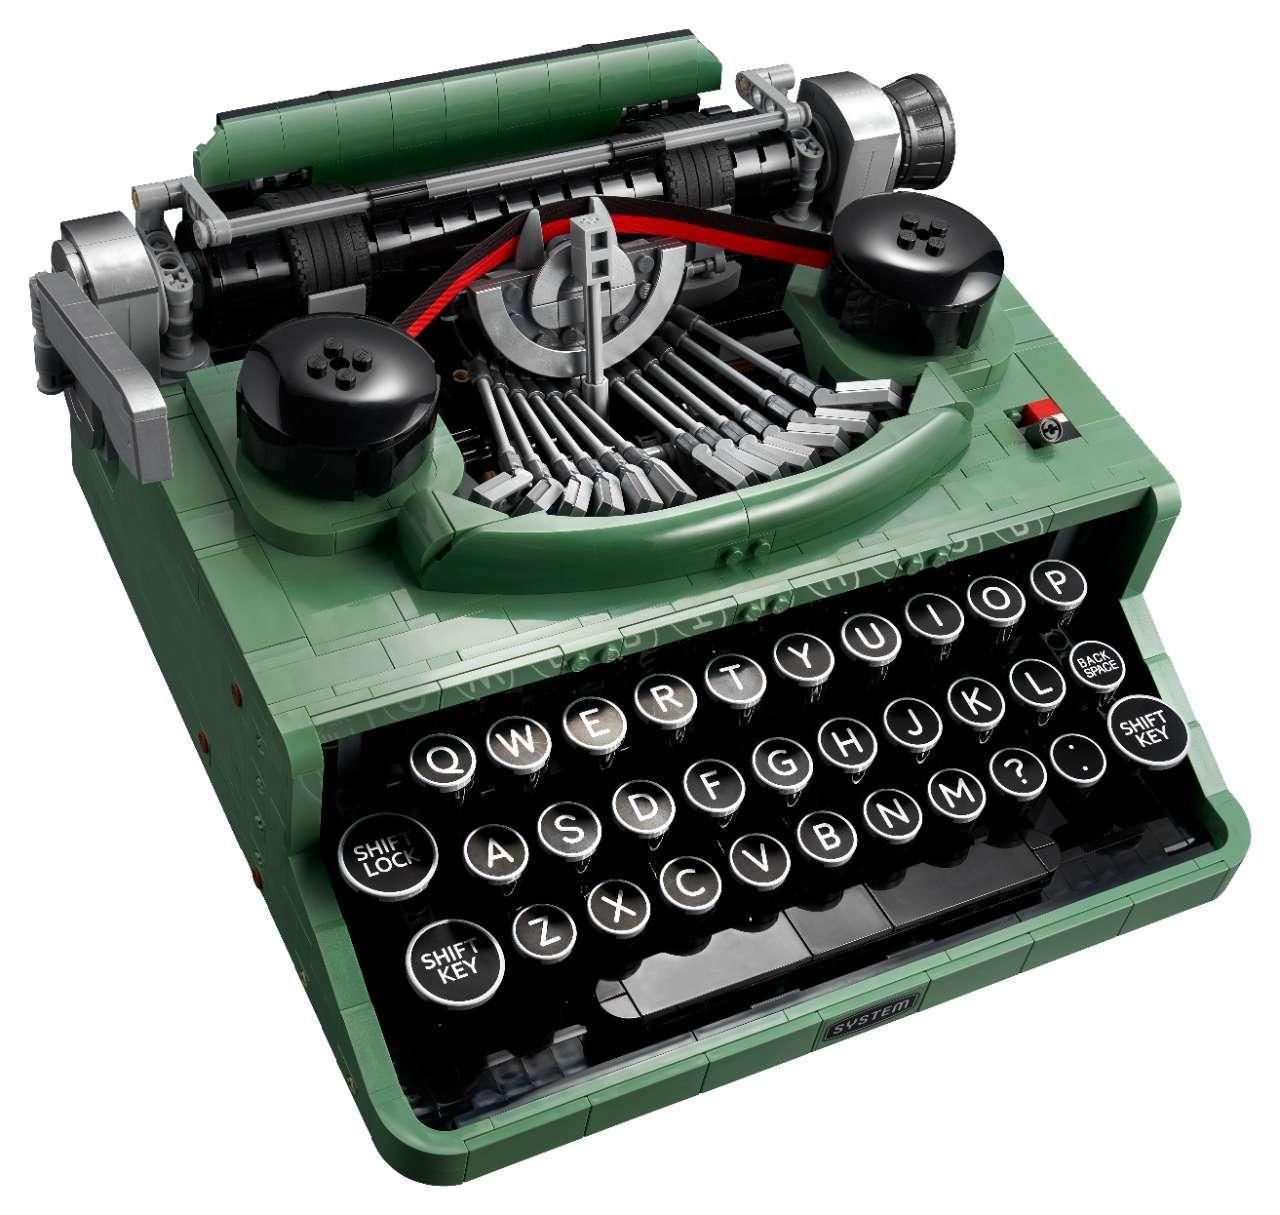 LEGO-Typerwriter-21327_Side_01